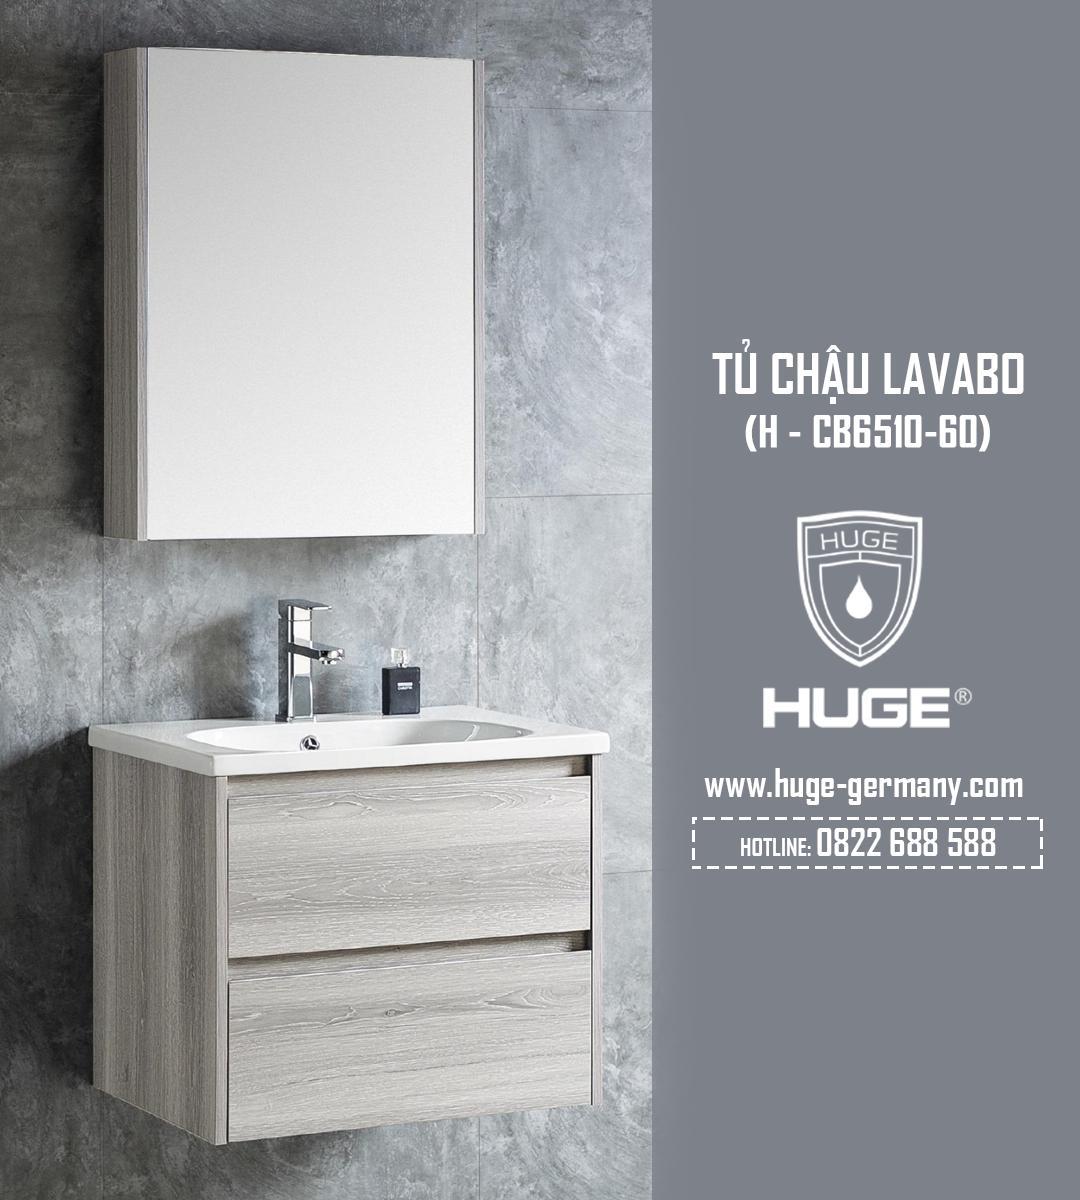 Tủ chậu Lavabo 600 (H-CB6510-60)